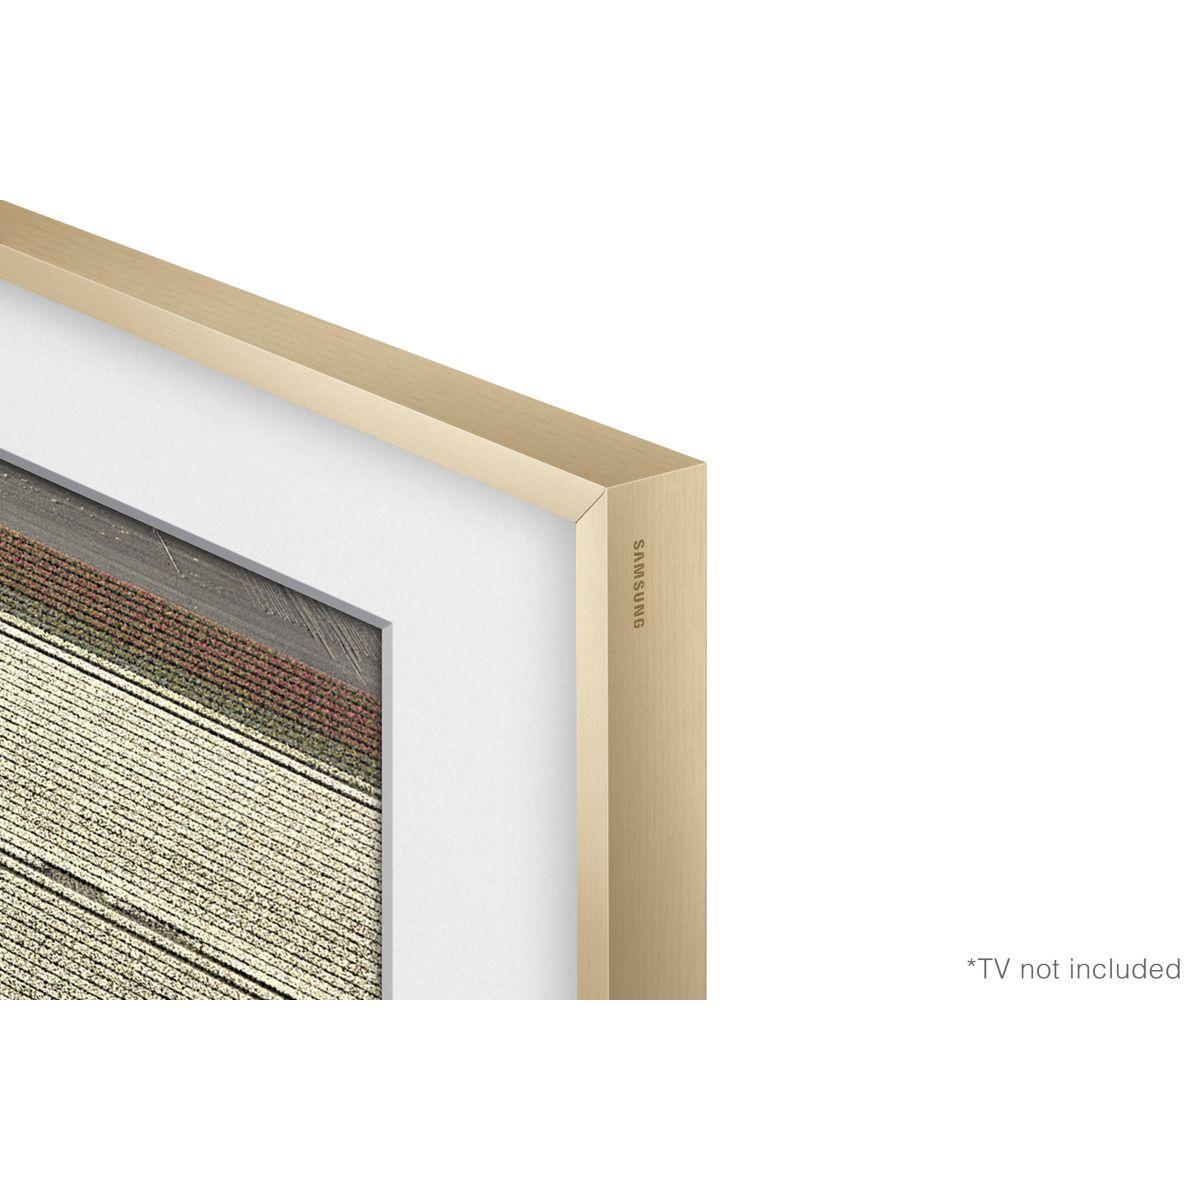 Cadre the frame samsung cadre vg-scfm65lw the frame light wood - 15% de remise imm�diate avec le code : fete15 (photo)